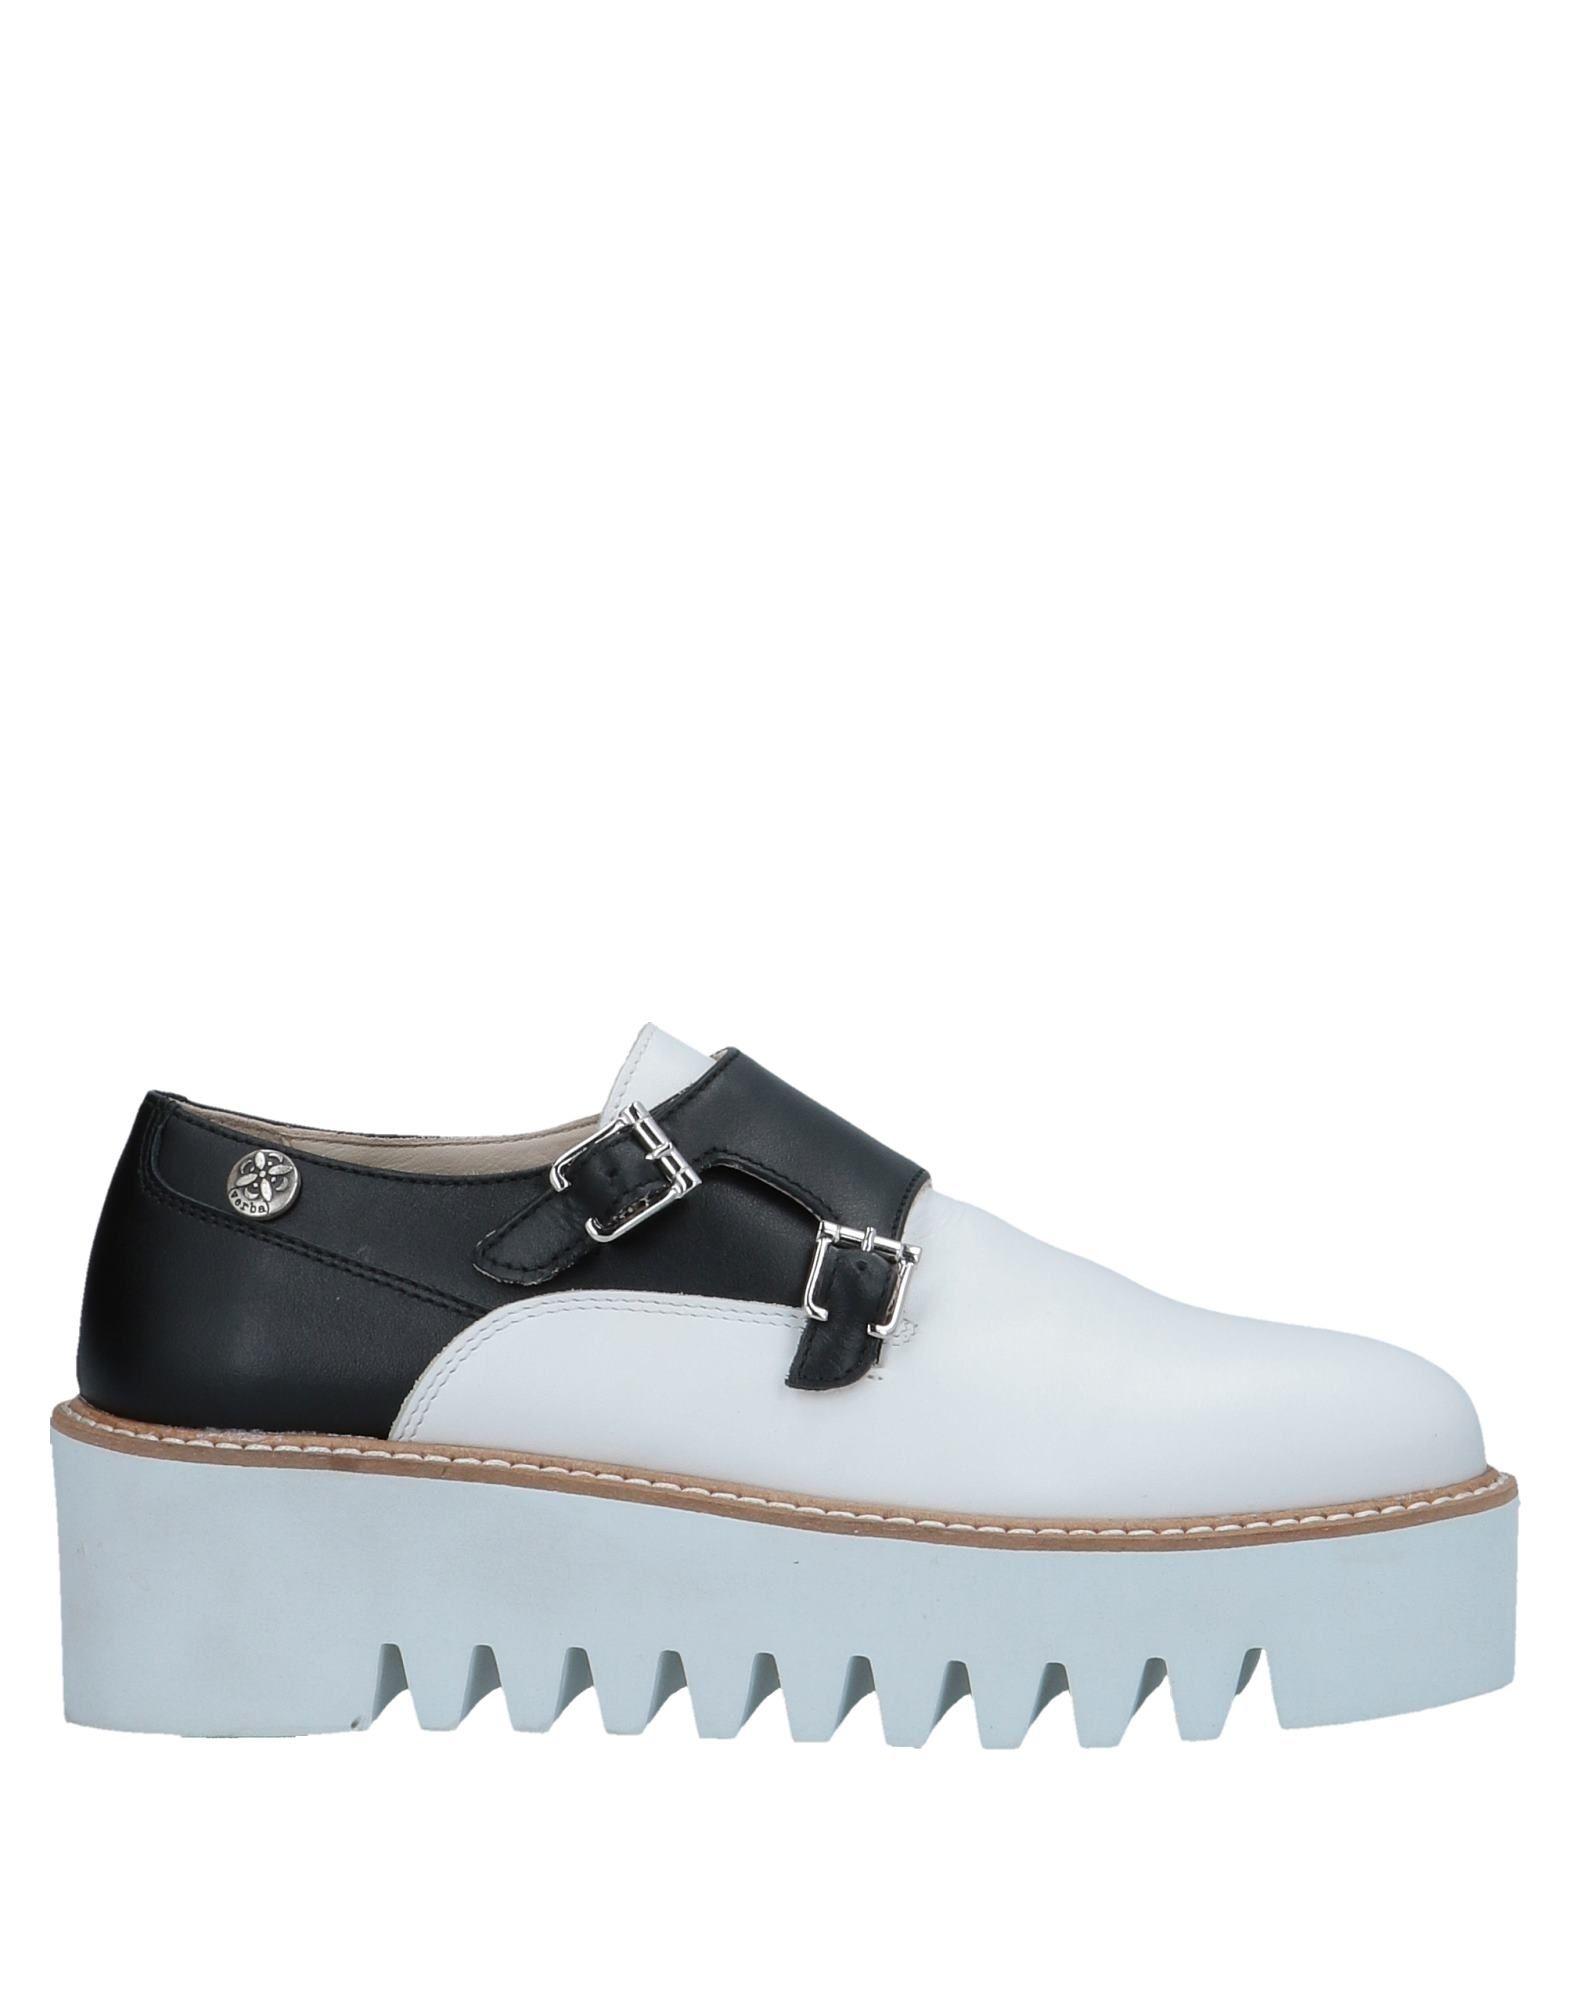 Gut um Verba billige Schuhe zu tragen( Verba um ) Schnürschuhe Damen  11508950DV c4a85d